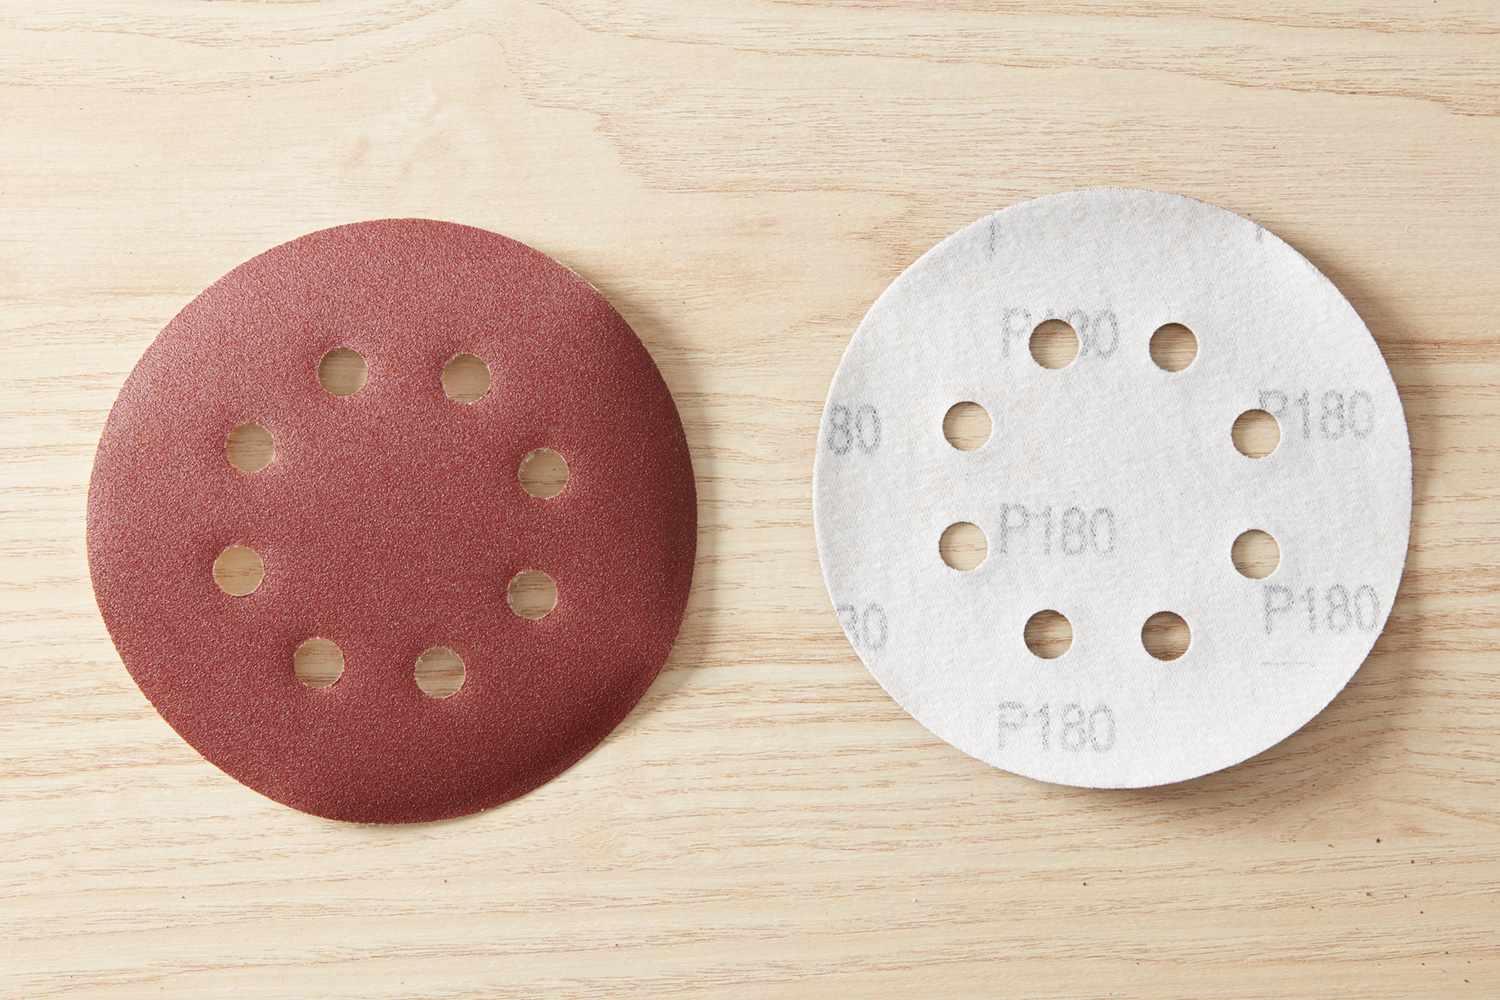 Fine sandpaper 180 grit